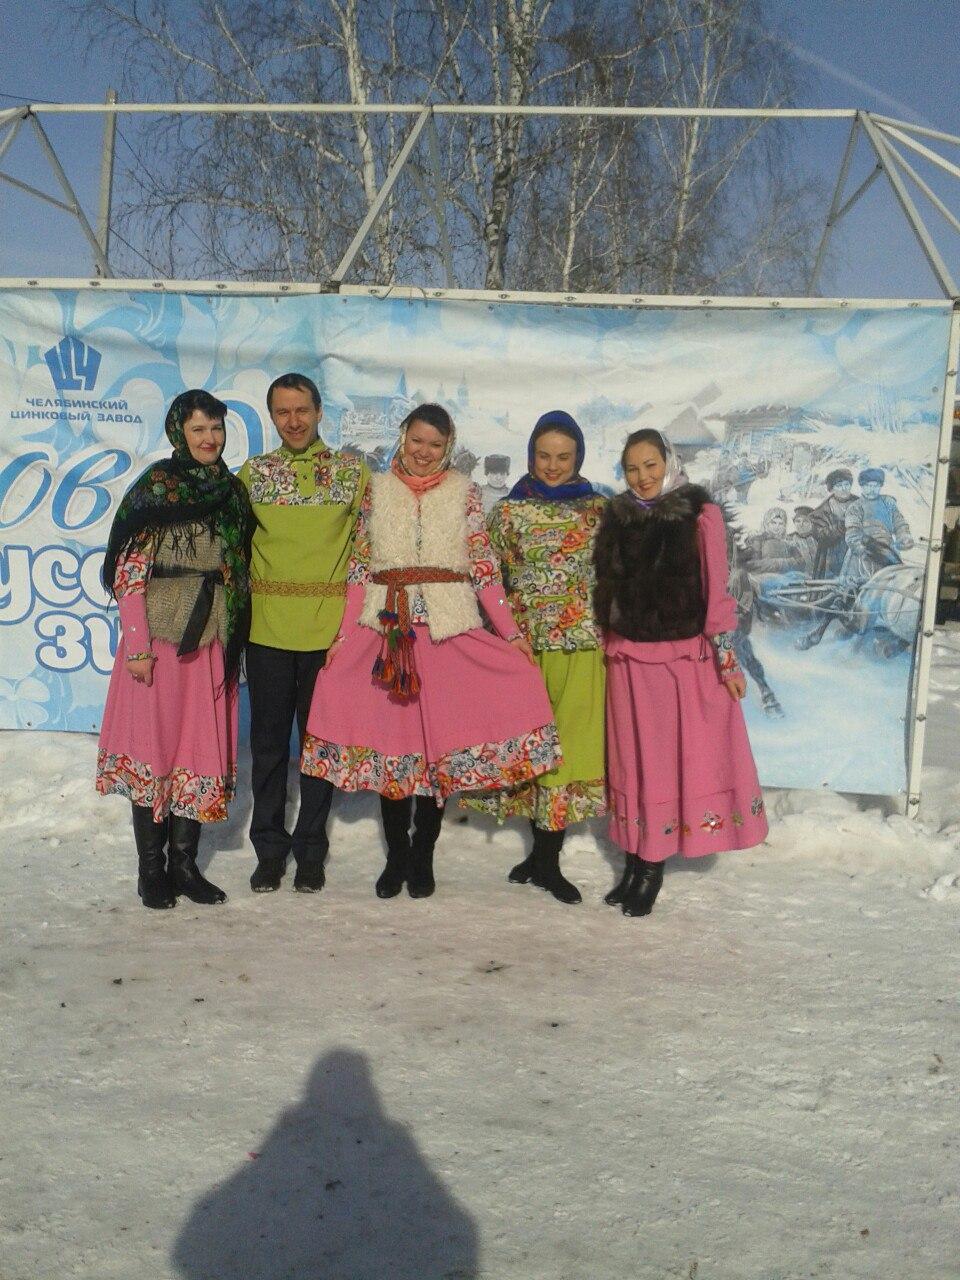 Проводы зимы Дубрава Лесня застава